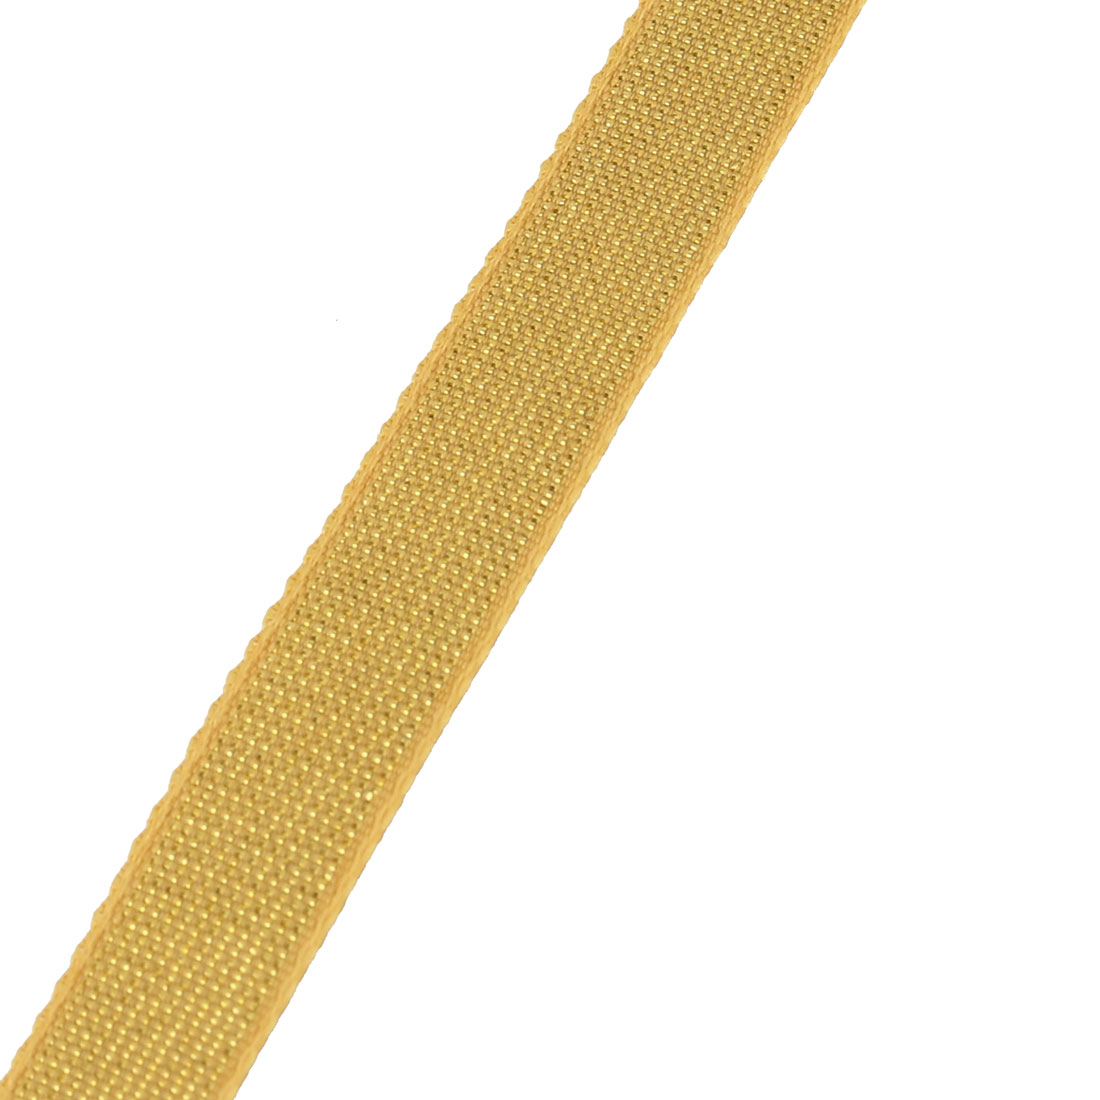 Decoration Velvet Bling Ribbon DIY Gift Headband Orange 50 Yard 1cm Width - image 2 of 4